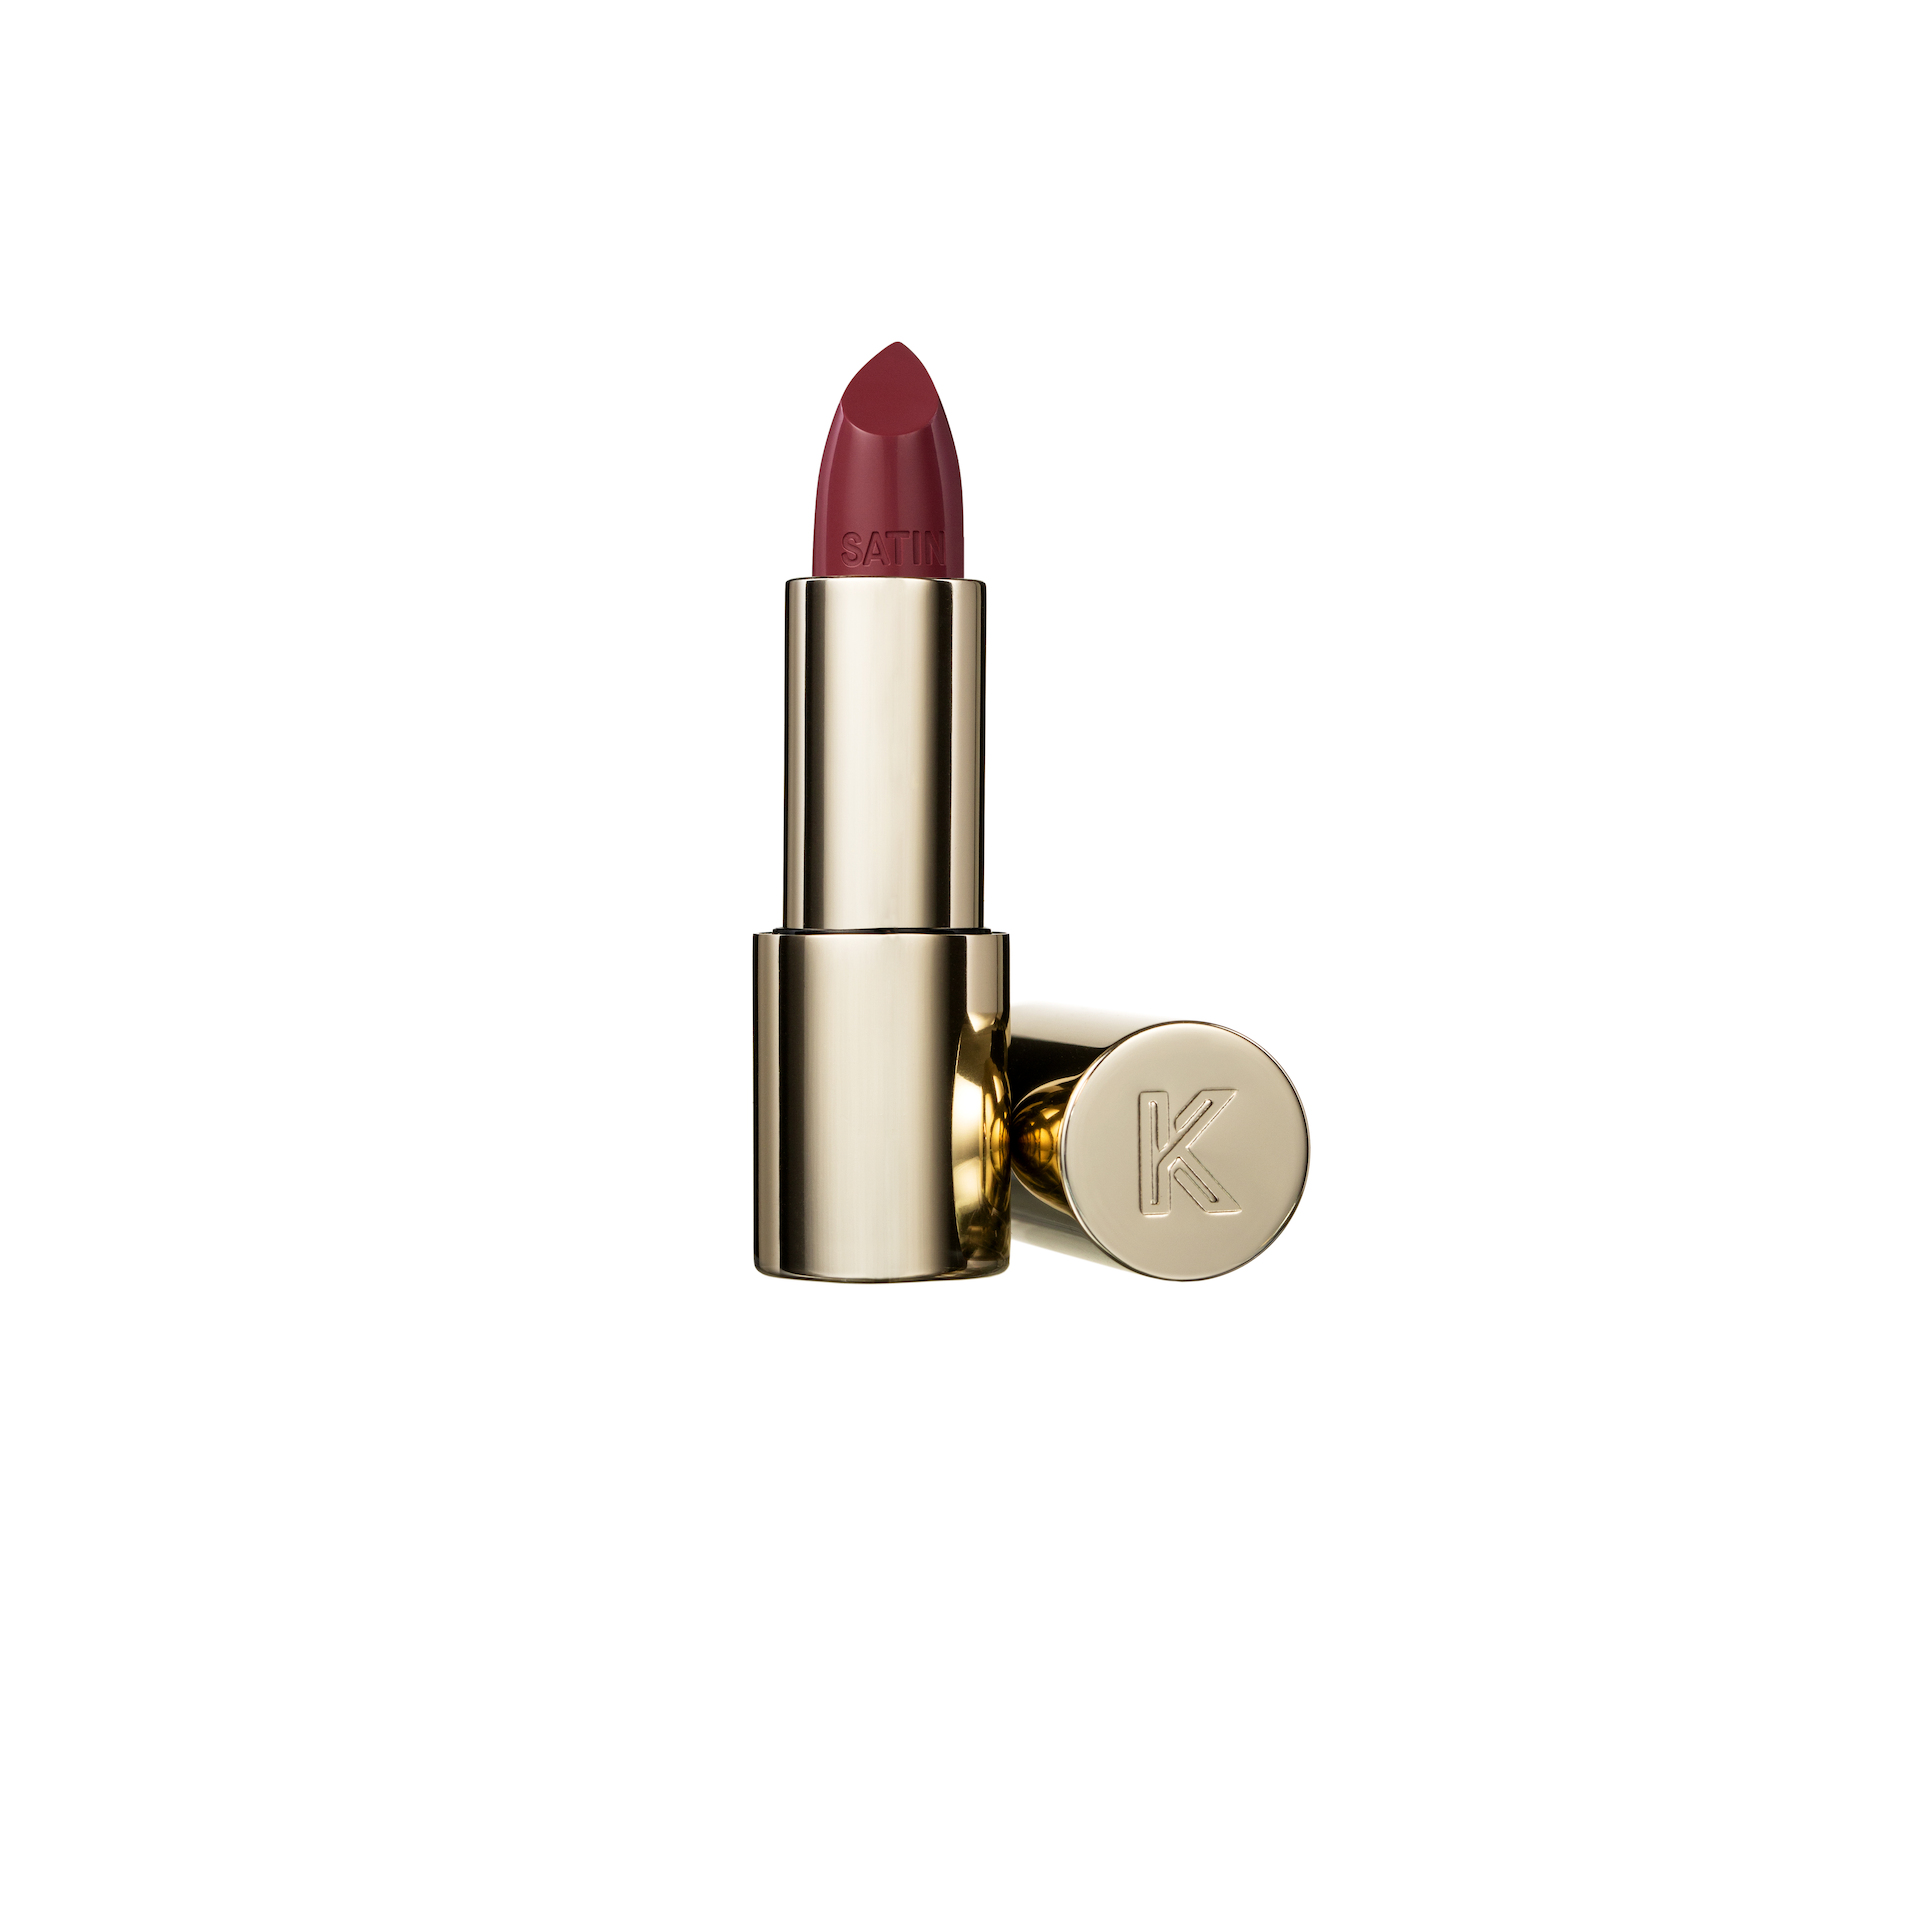 Satin Lipstick 05 Just Kissed